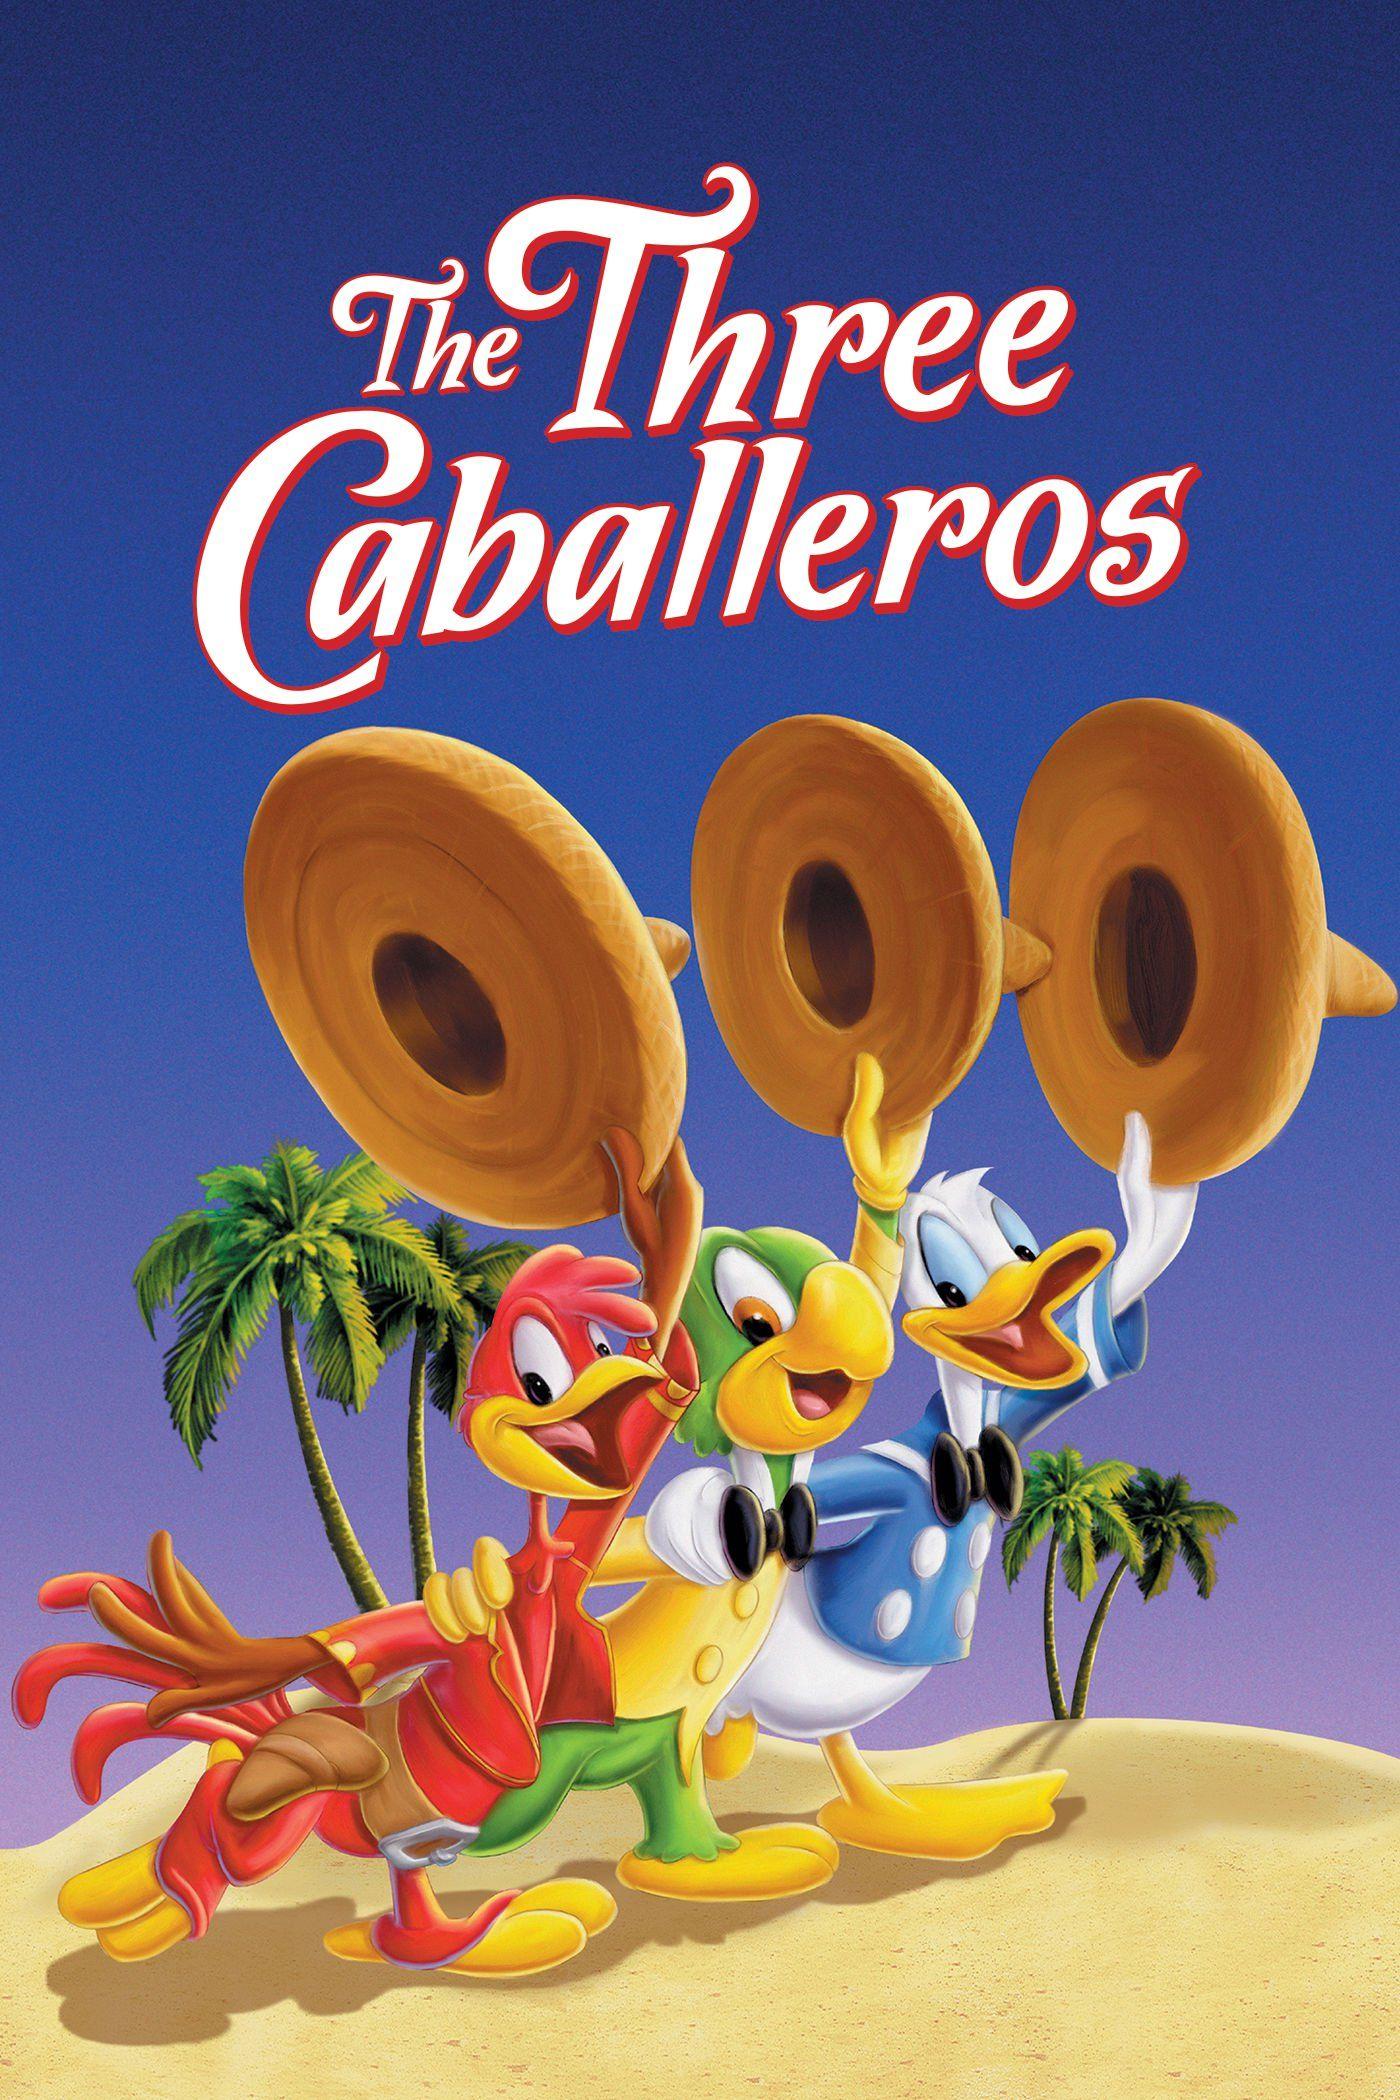 4cejsypl5u9k9py5wvio62udvzp Jpg 1400 2100 Disney Movies Anywhere Walt Disney Movies Three Caballeros